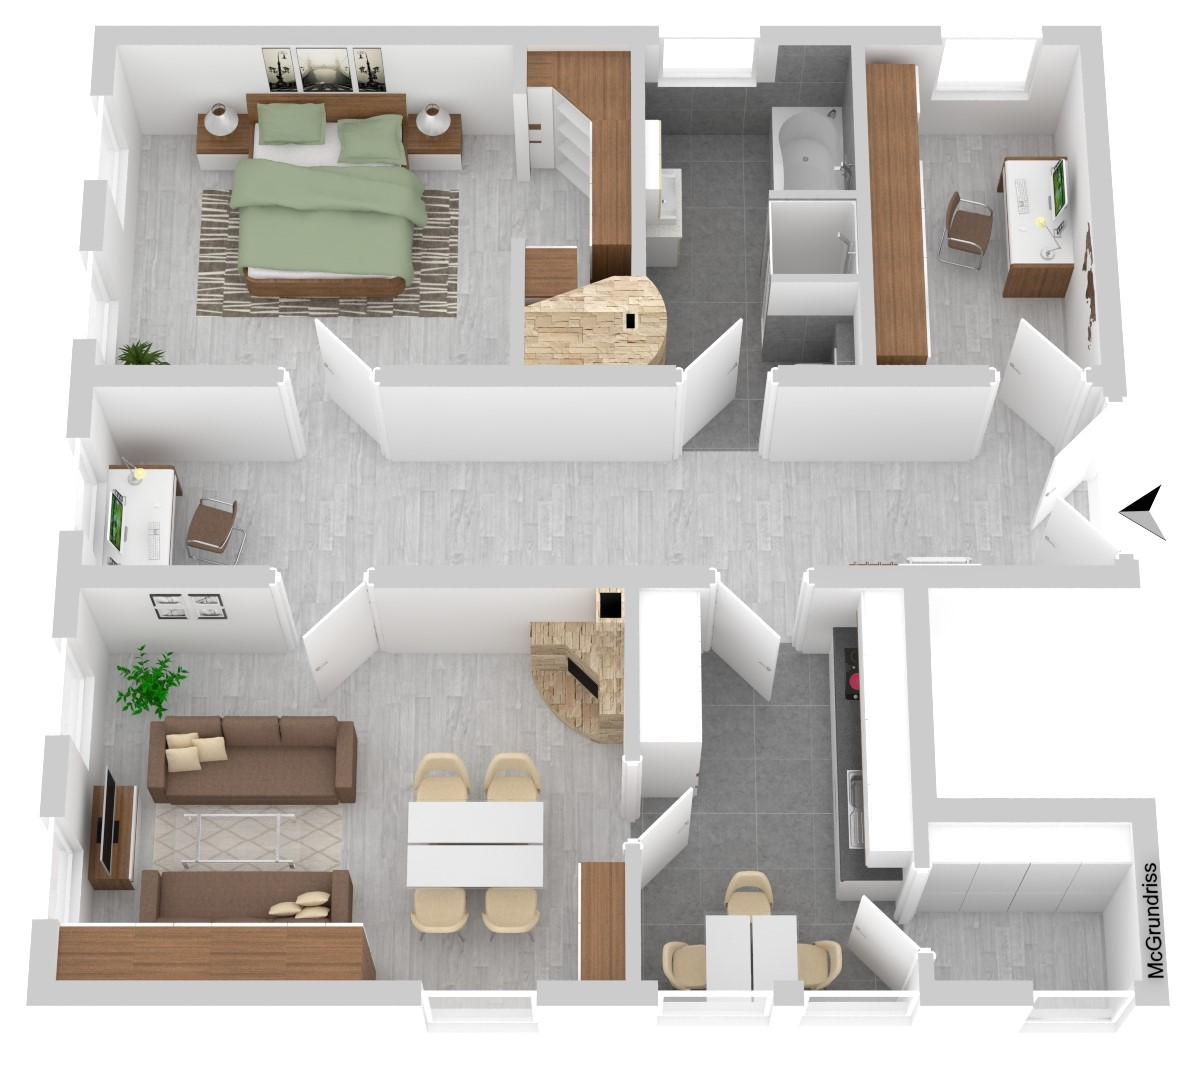 Wohnung Nr. 2 (96,08 m²)